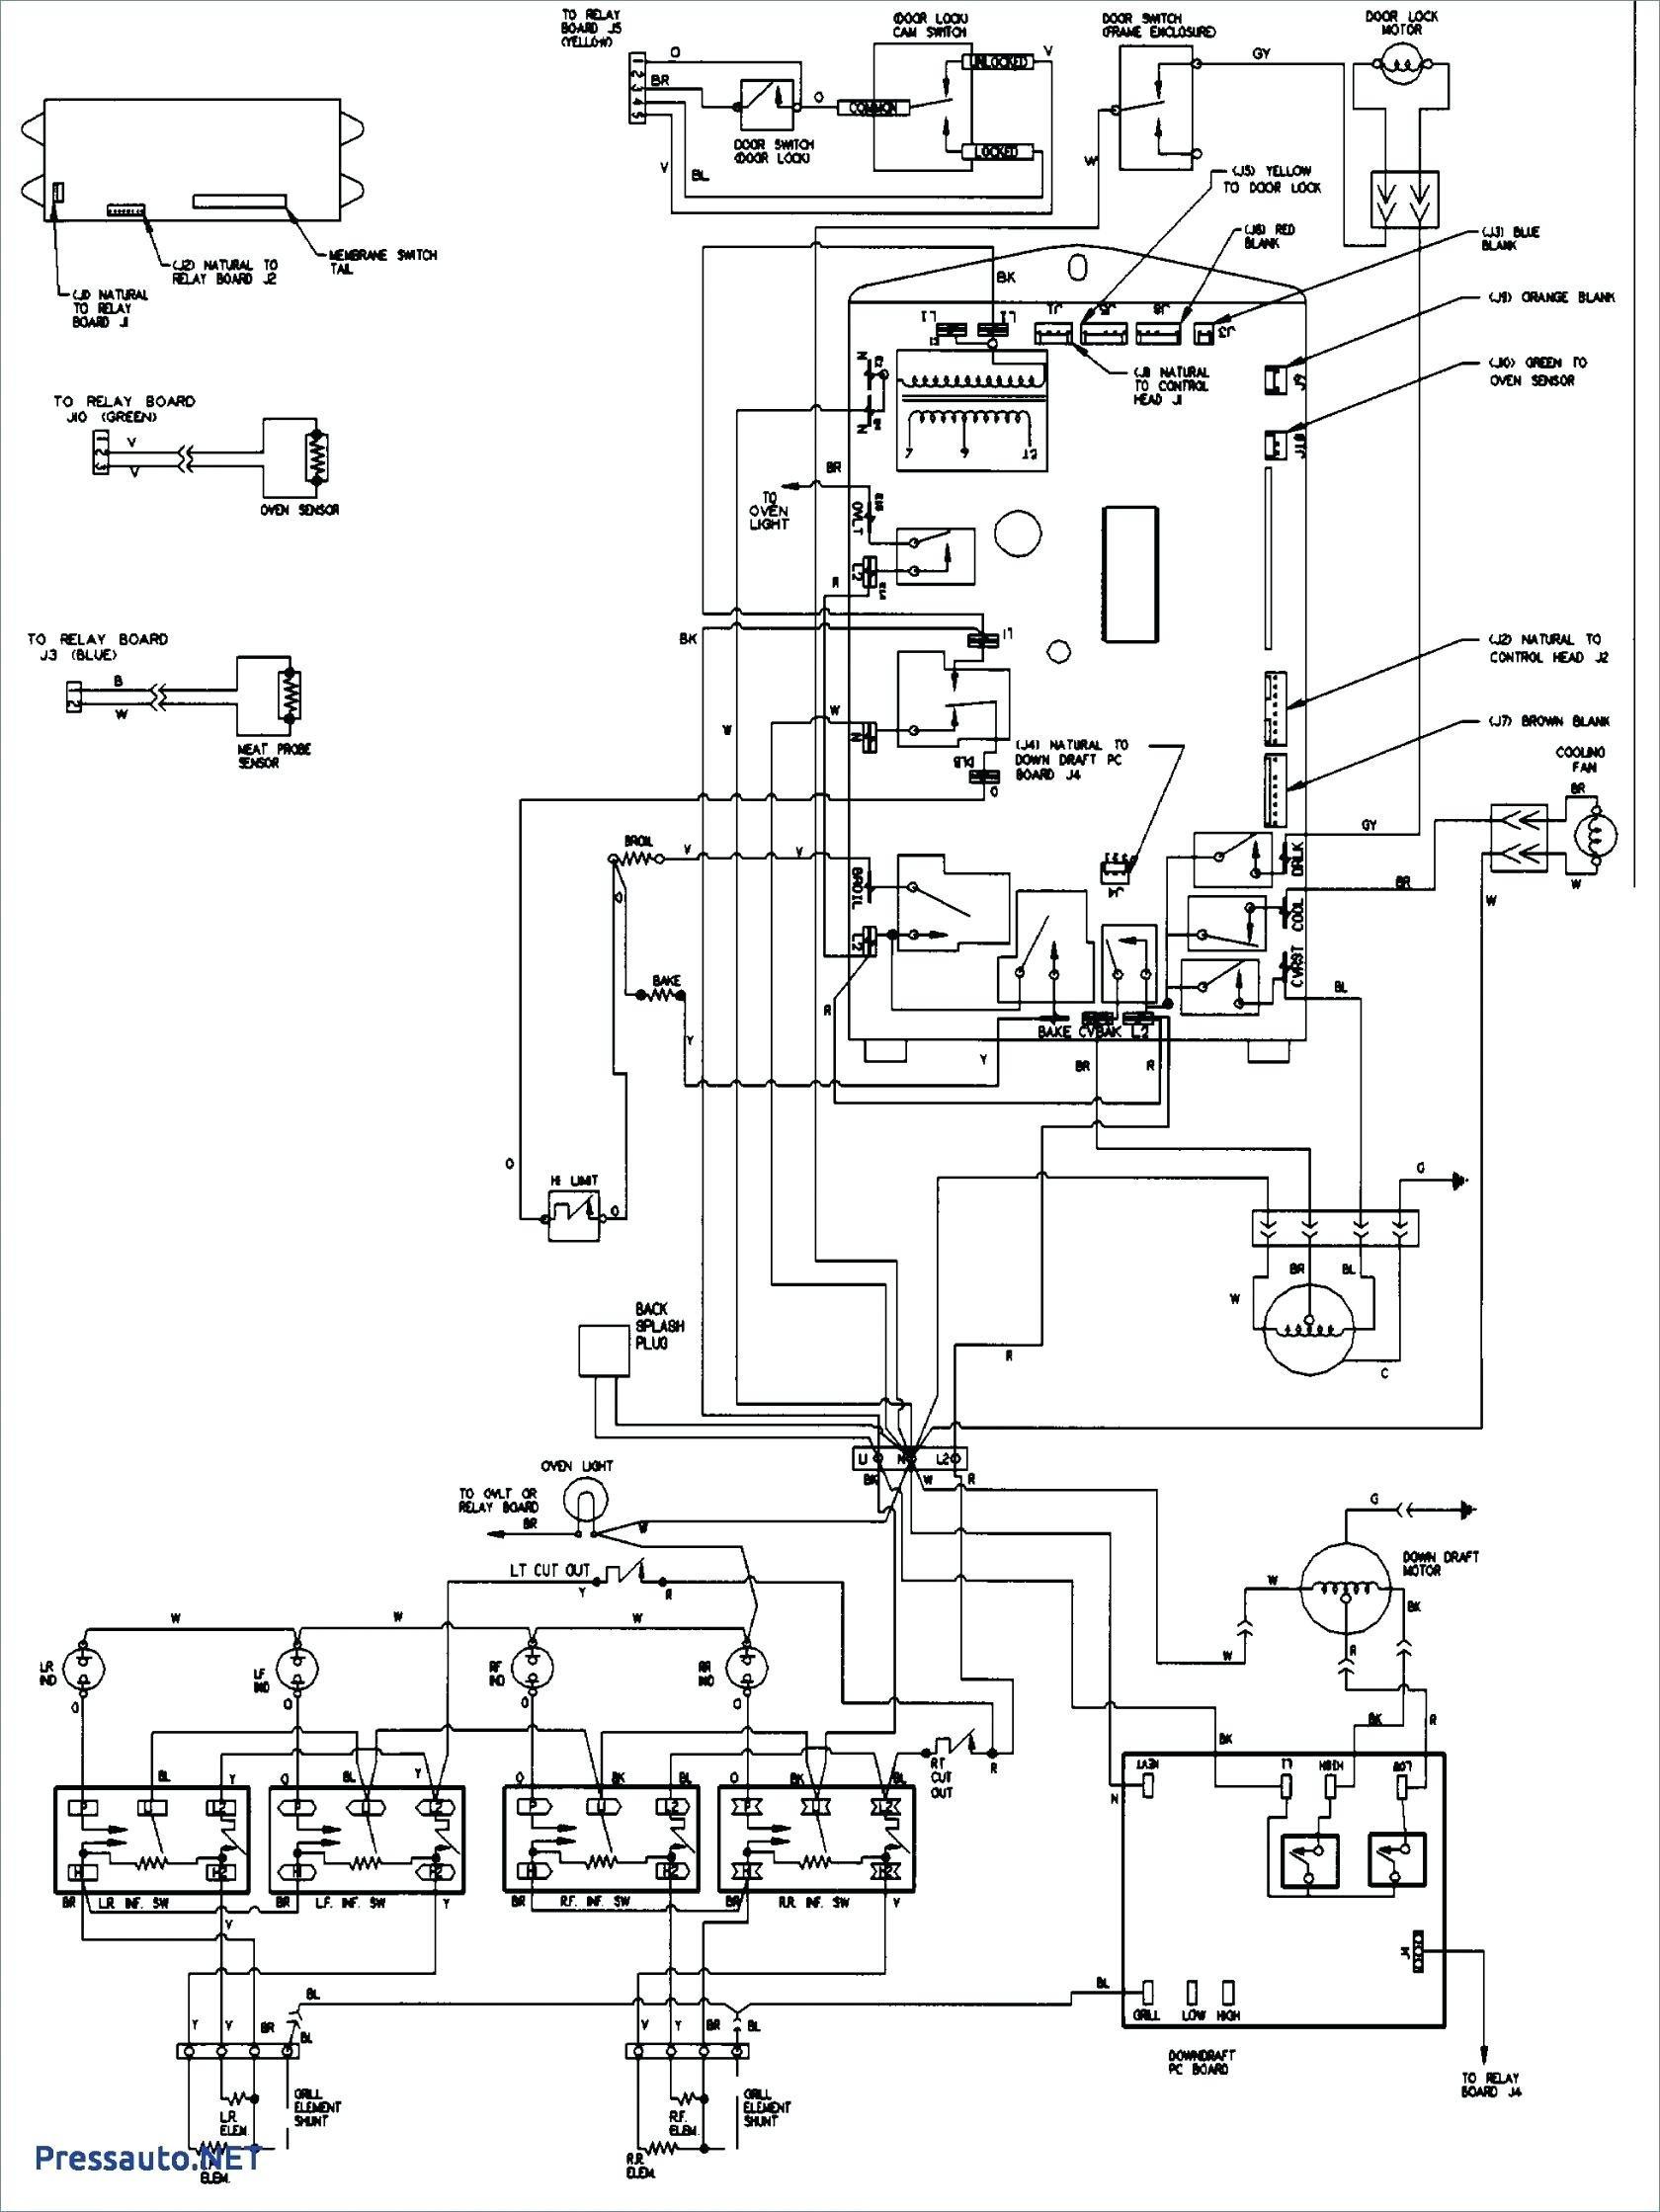 Lennox G12 Wiring Diagram Furnace Best Wiring Diagram